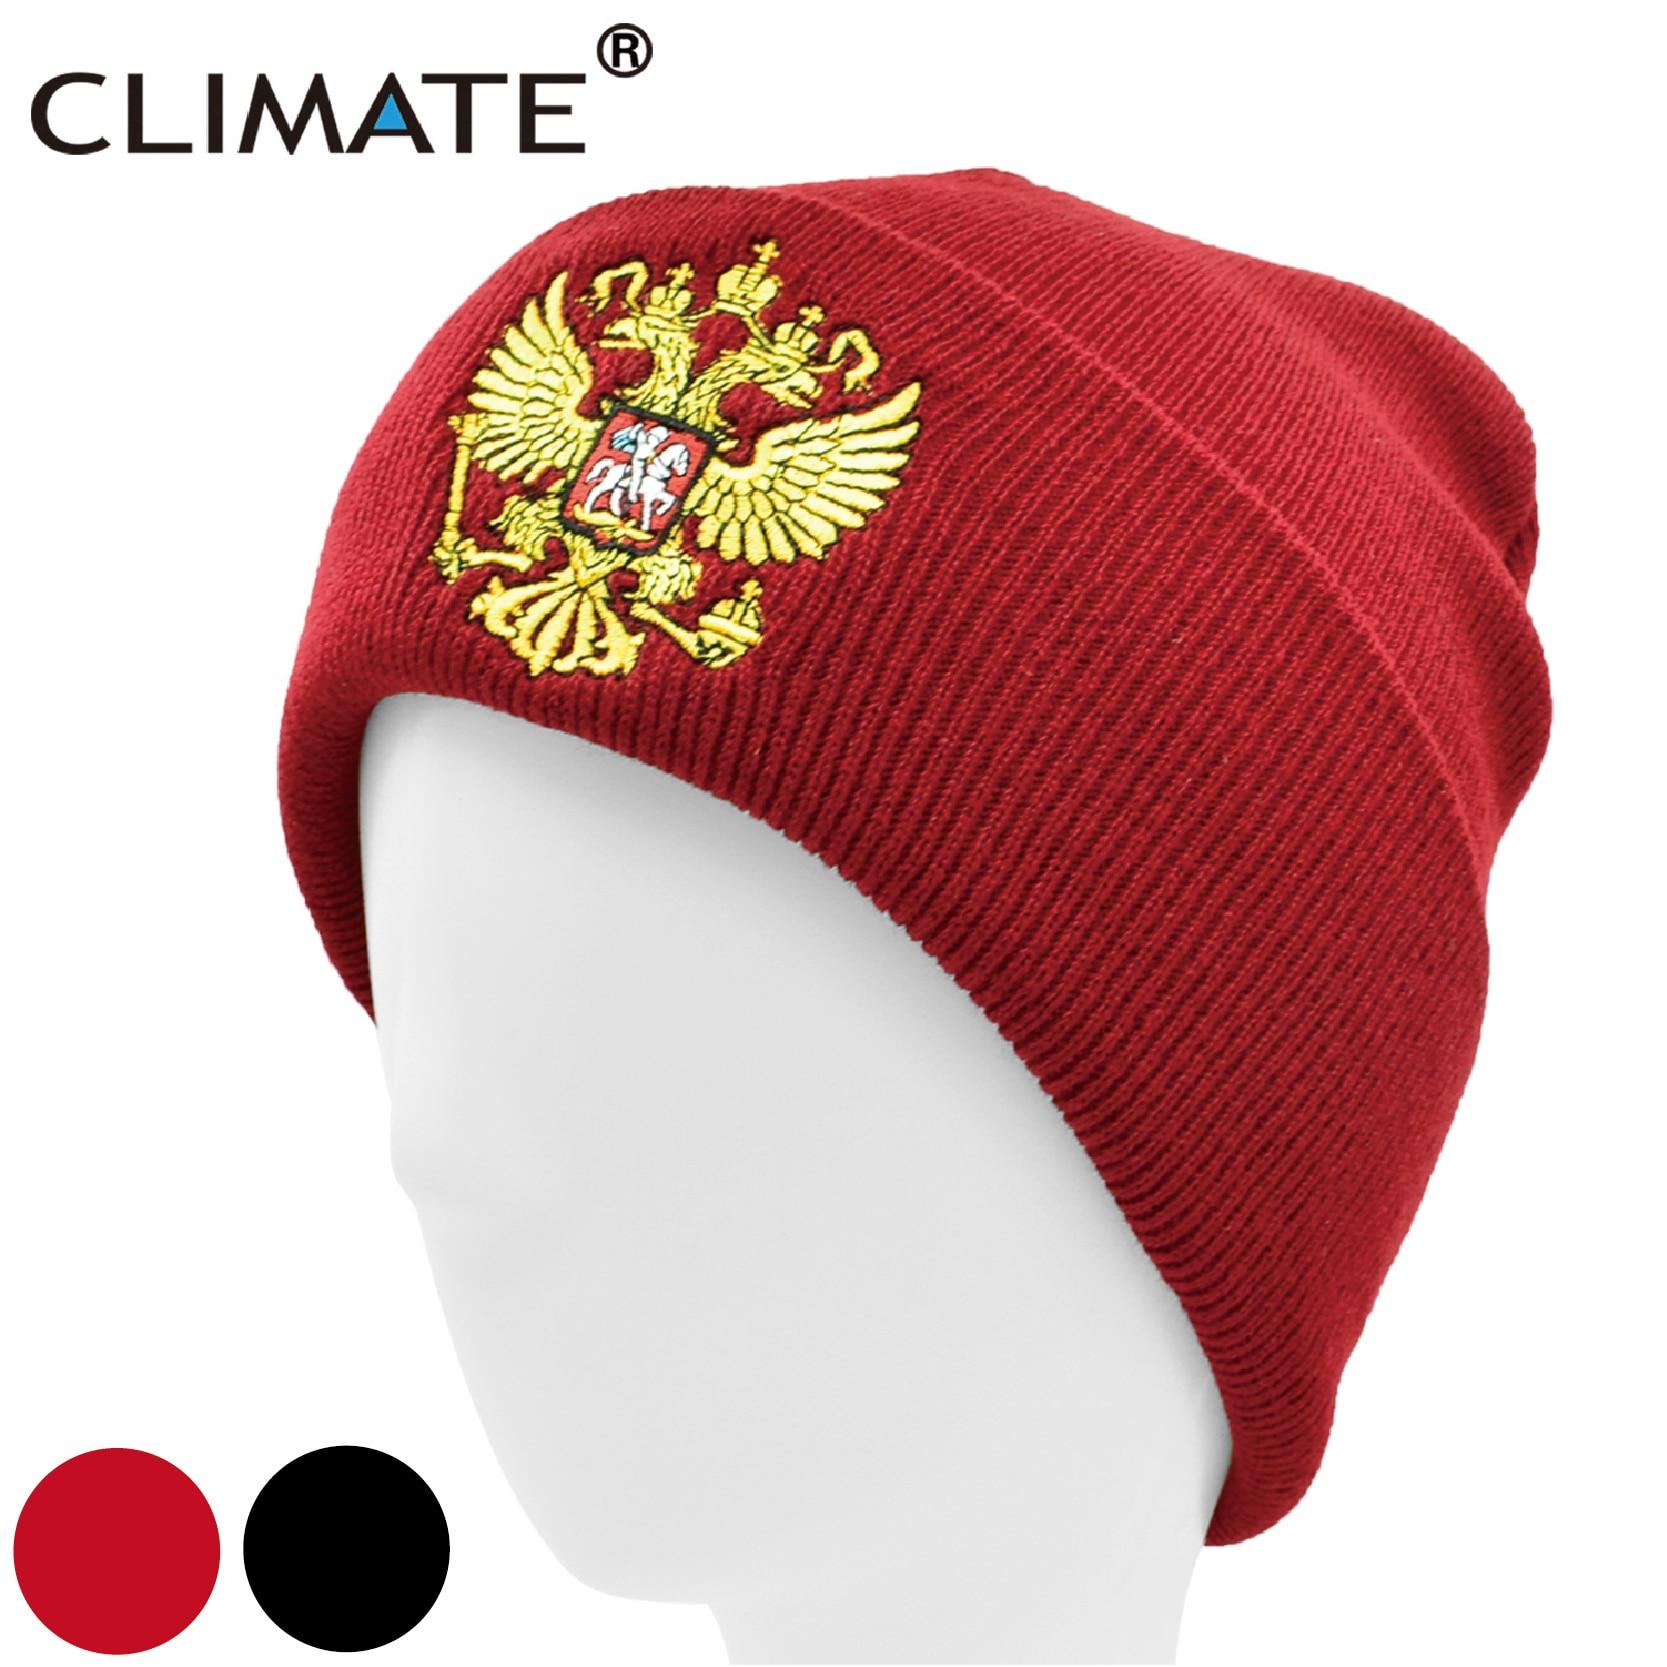 CLIMATE Men Russia Beanie Hat Russian Emblem Winter Beanie National Day Skullies Men Women Warm Knitted Hats Cap For Men Women